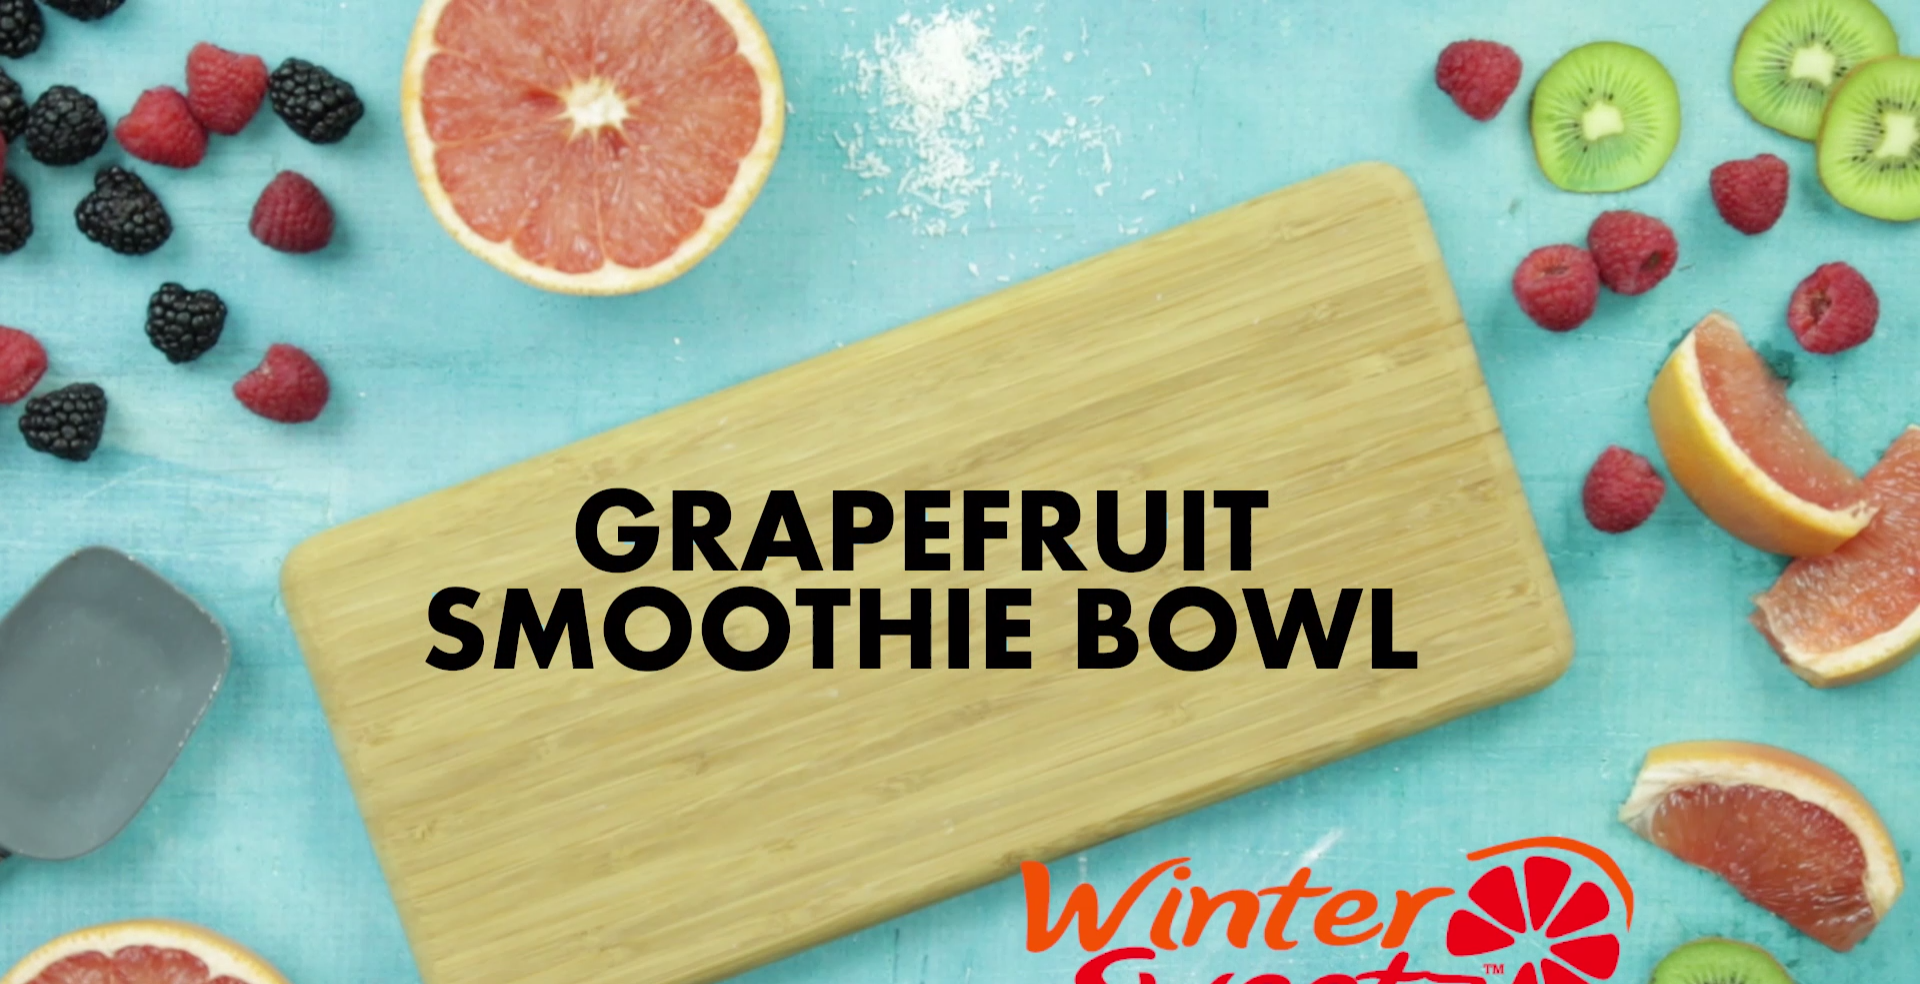 Grapefruit Smoothie Bowl